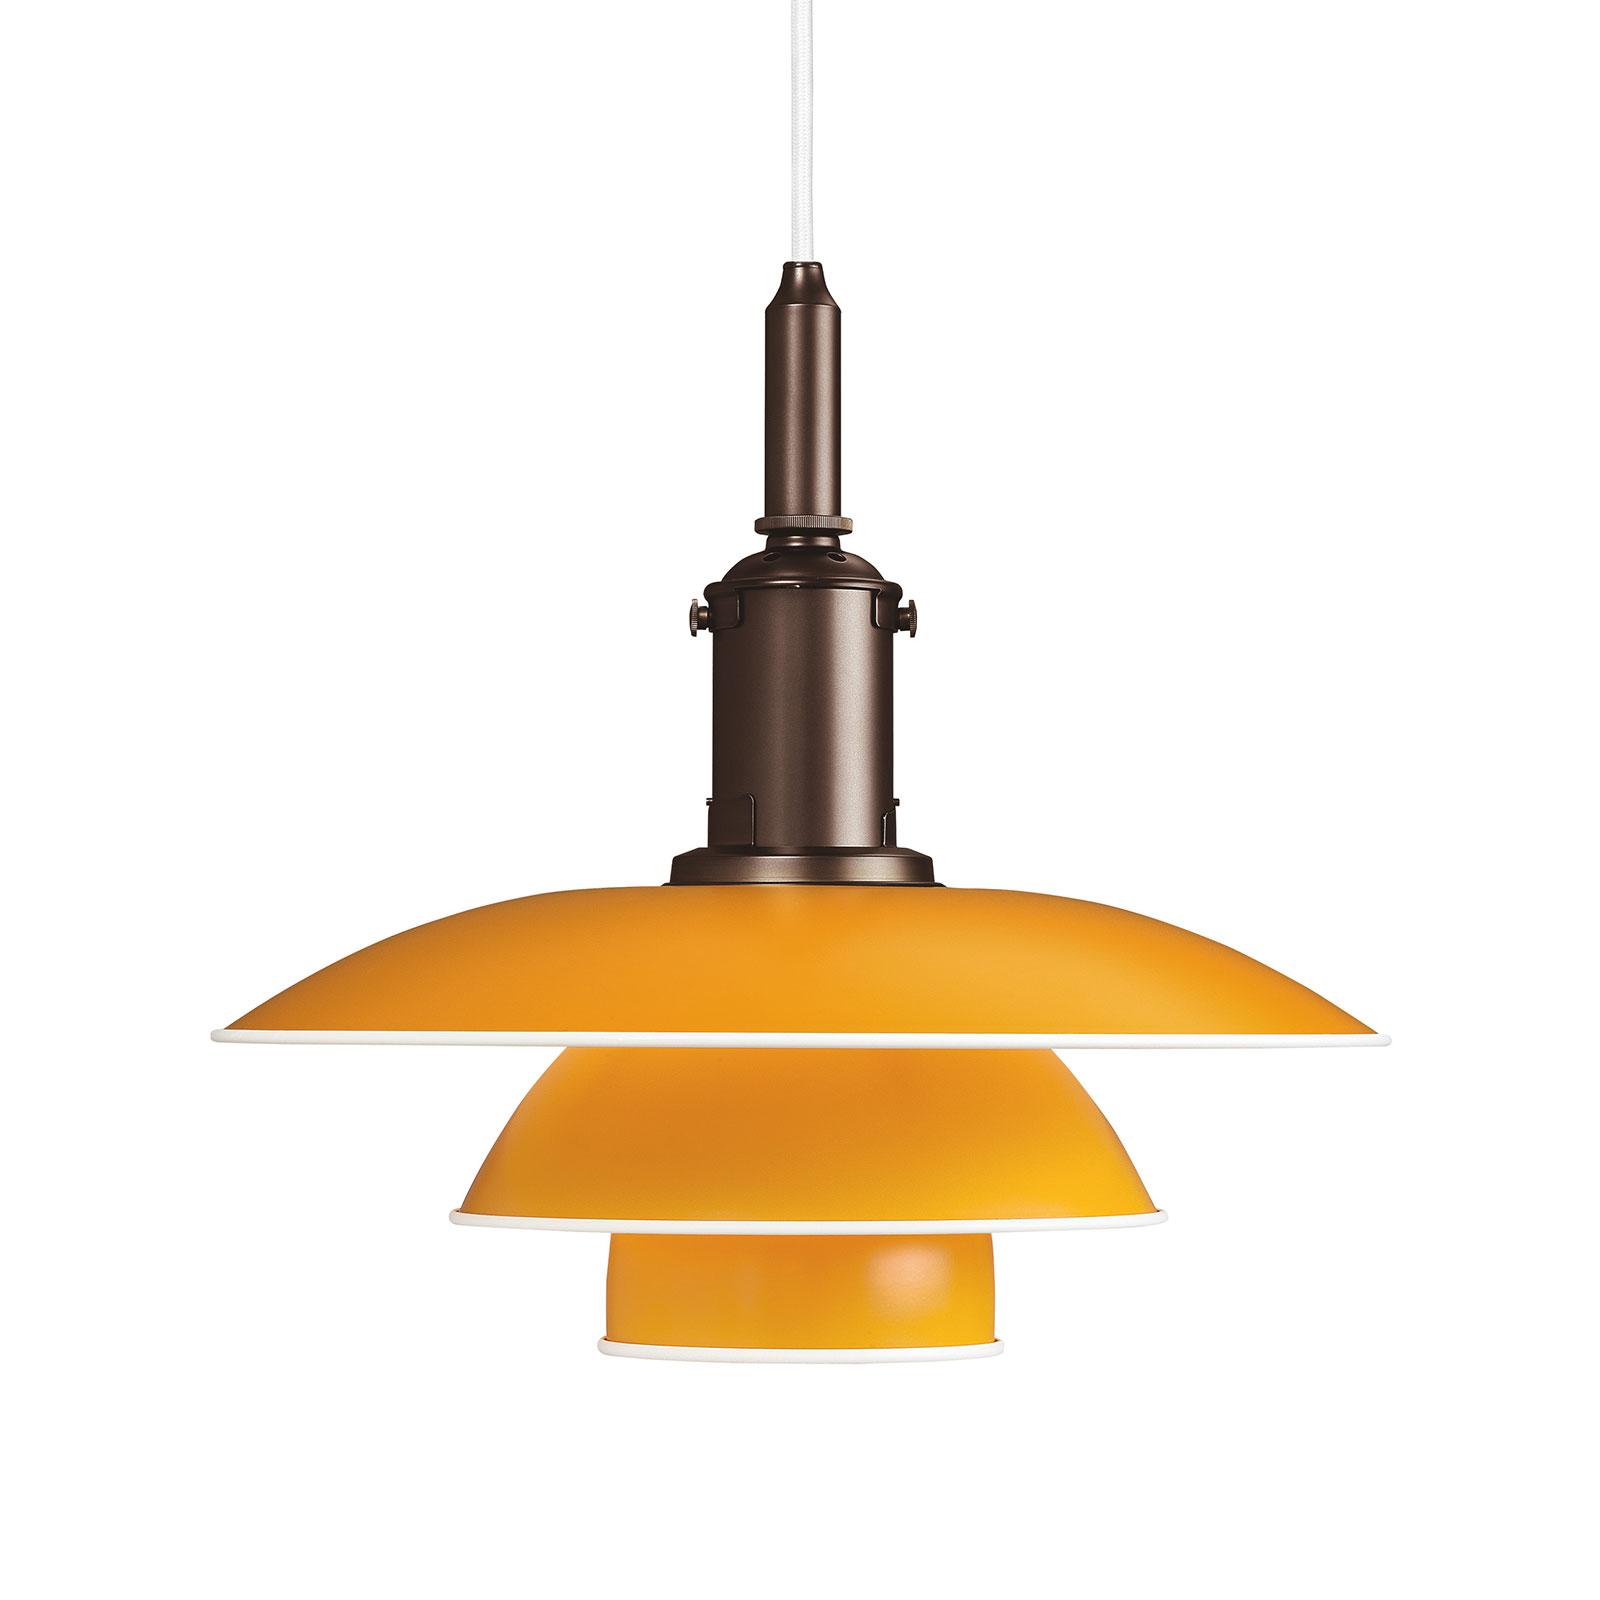 Louis Poulsen PH 3 1/2-3 hængelampe kobber/gul